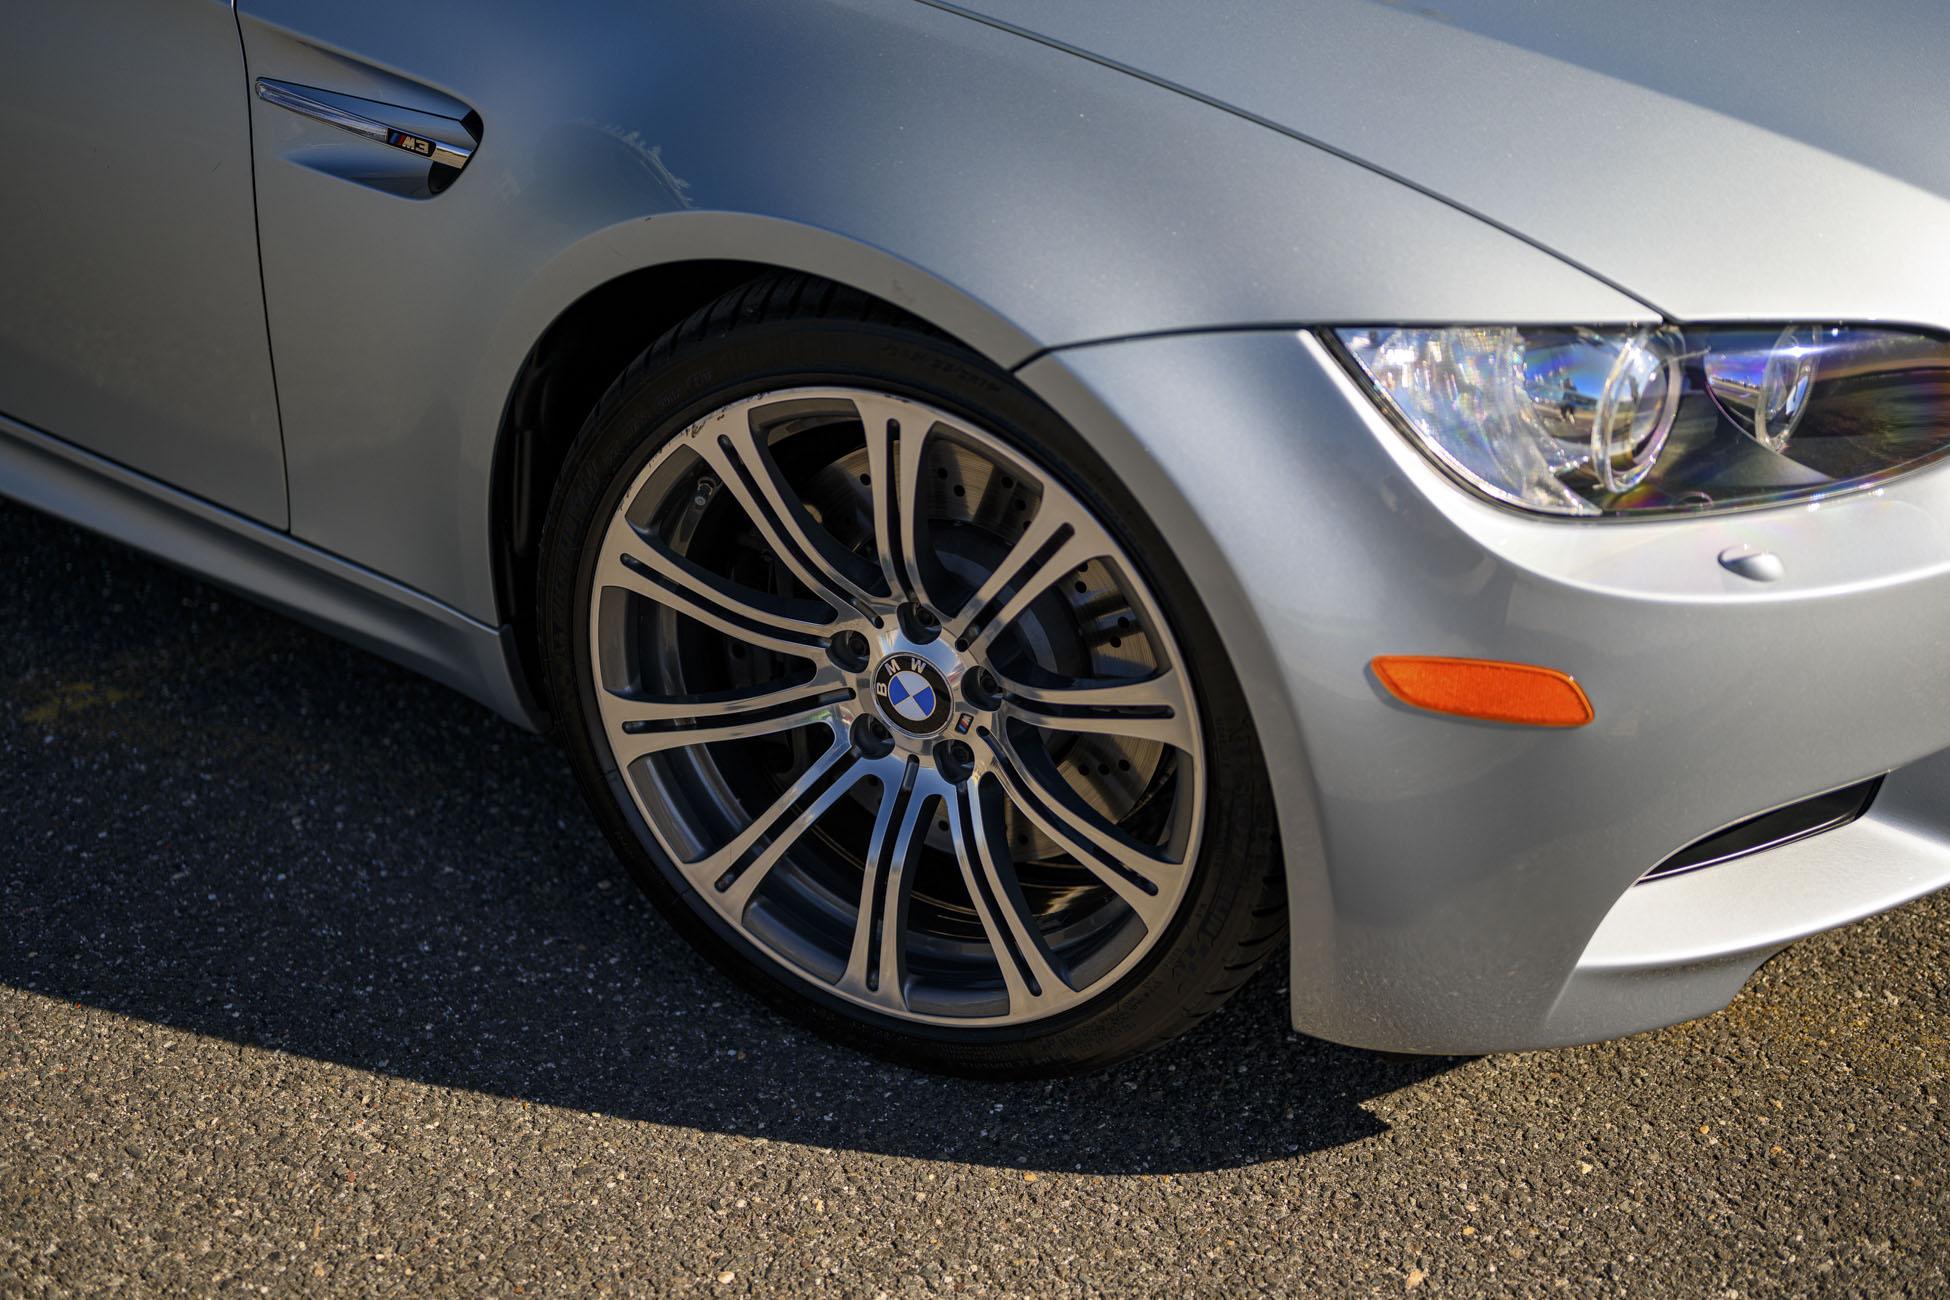 BMW style 220 wheels